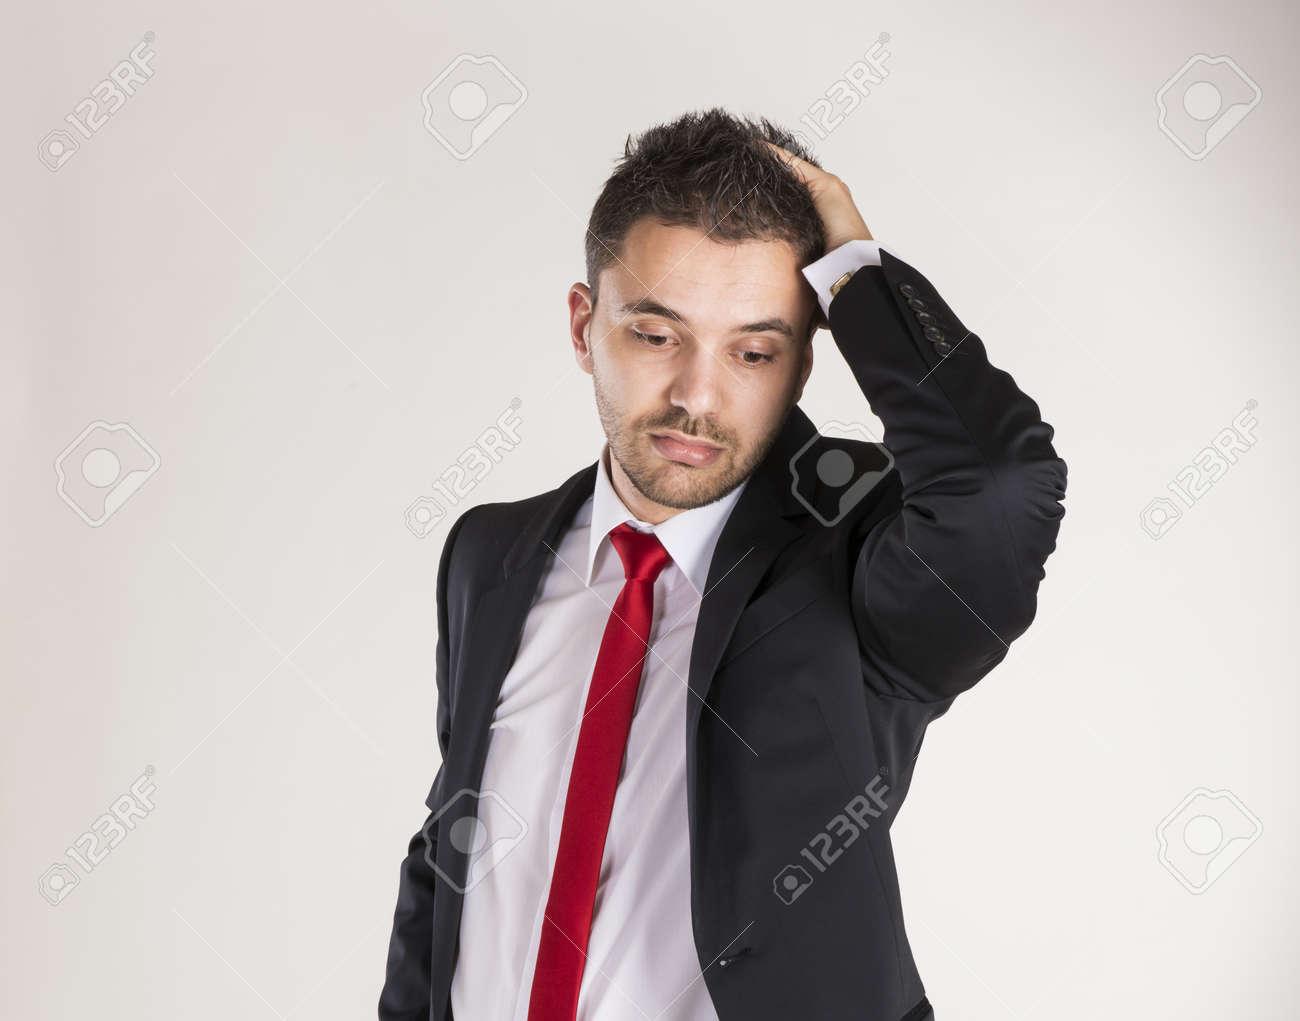 Successful business man is posing in studio Stock Photo - 22567498